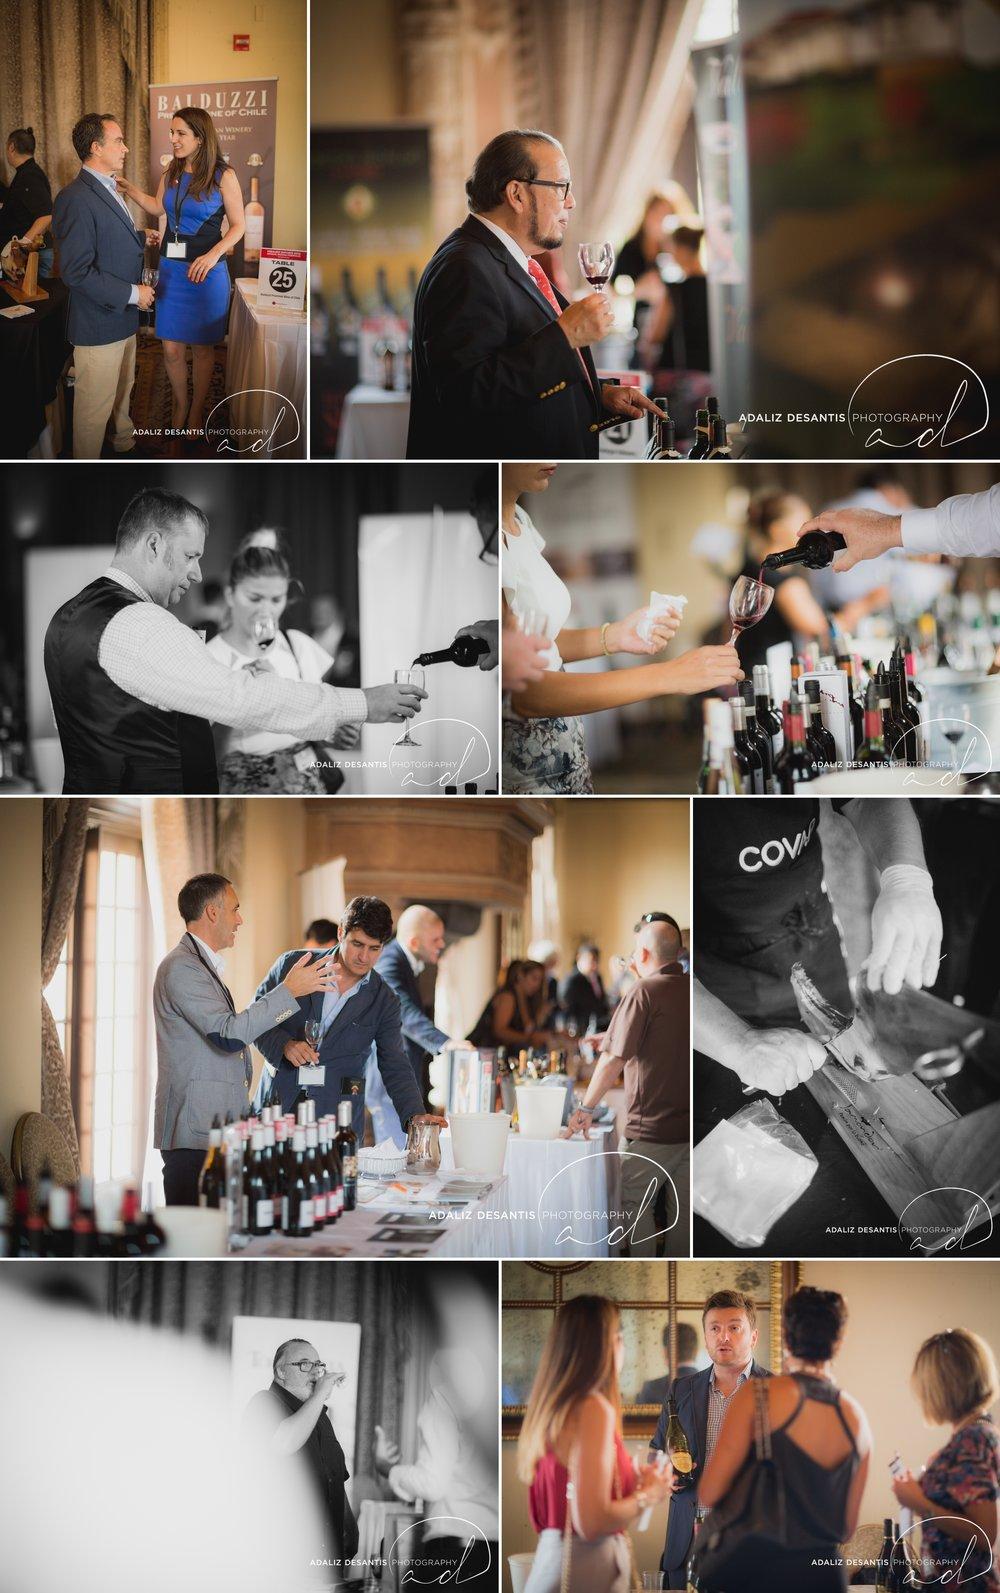 hidalgo imports anniversary wine spirits tasting biltmore hotel coral gables florida miami 6.jpg